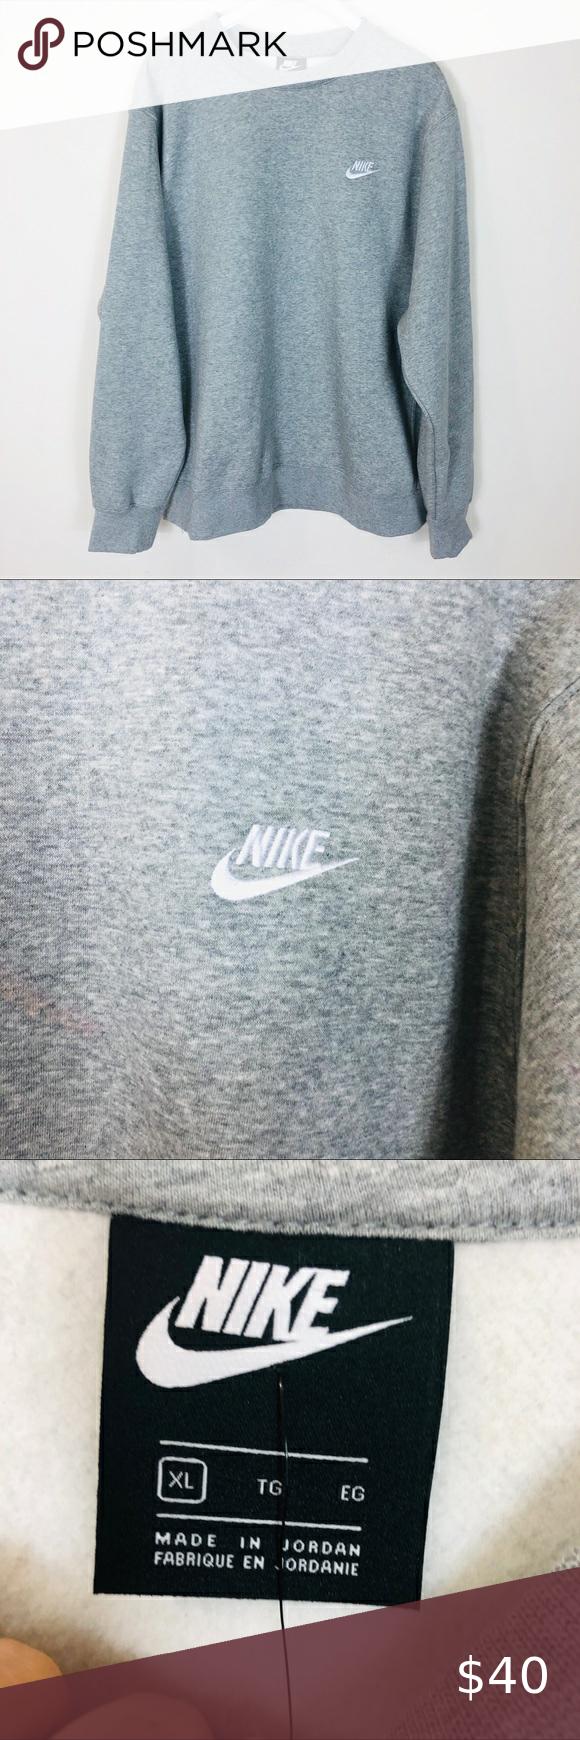 Nike Sportswear Club Grey Crewneck Sweatshirt Nwt Crew Neck Sweatshirt Grey Crewneck Nike Sportswear [ 1740 x 580 Pixel ]